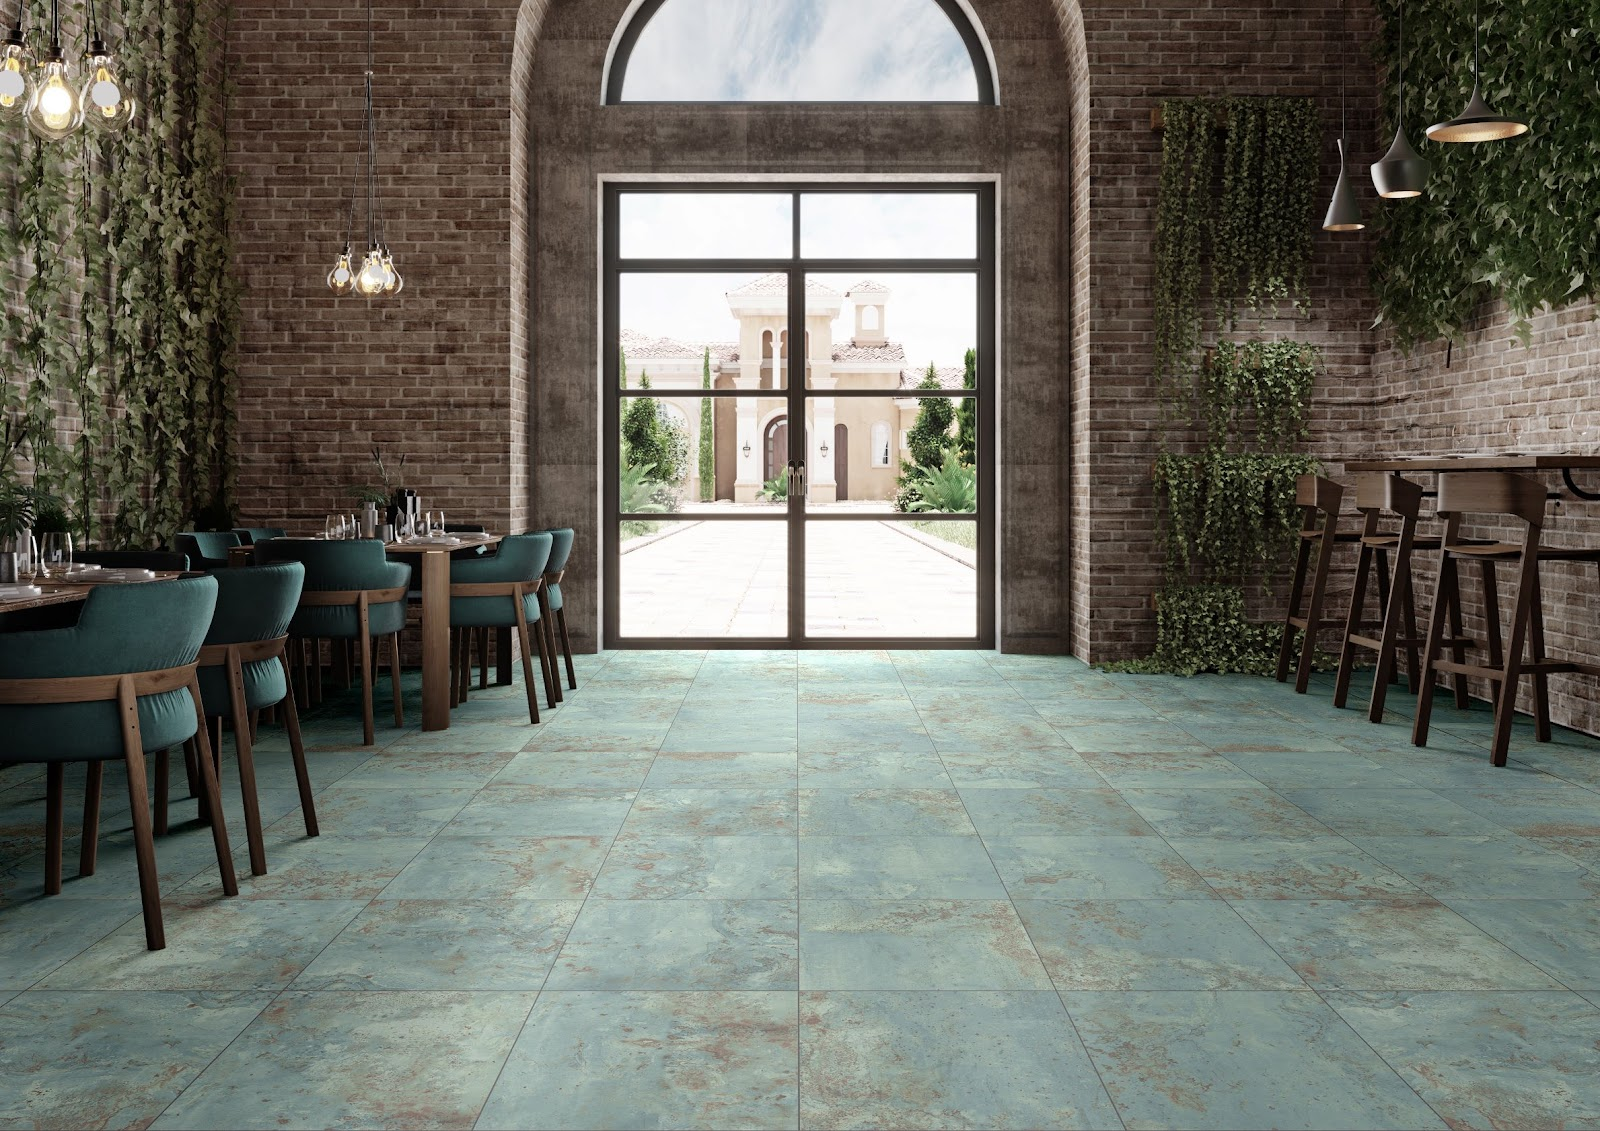 Oxidized green ceramic tile flooring in a restaurant